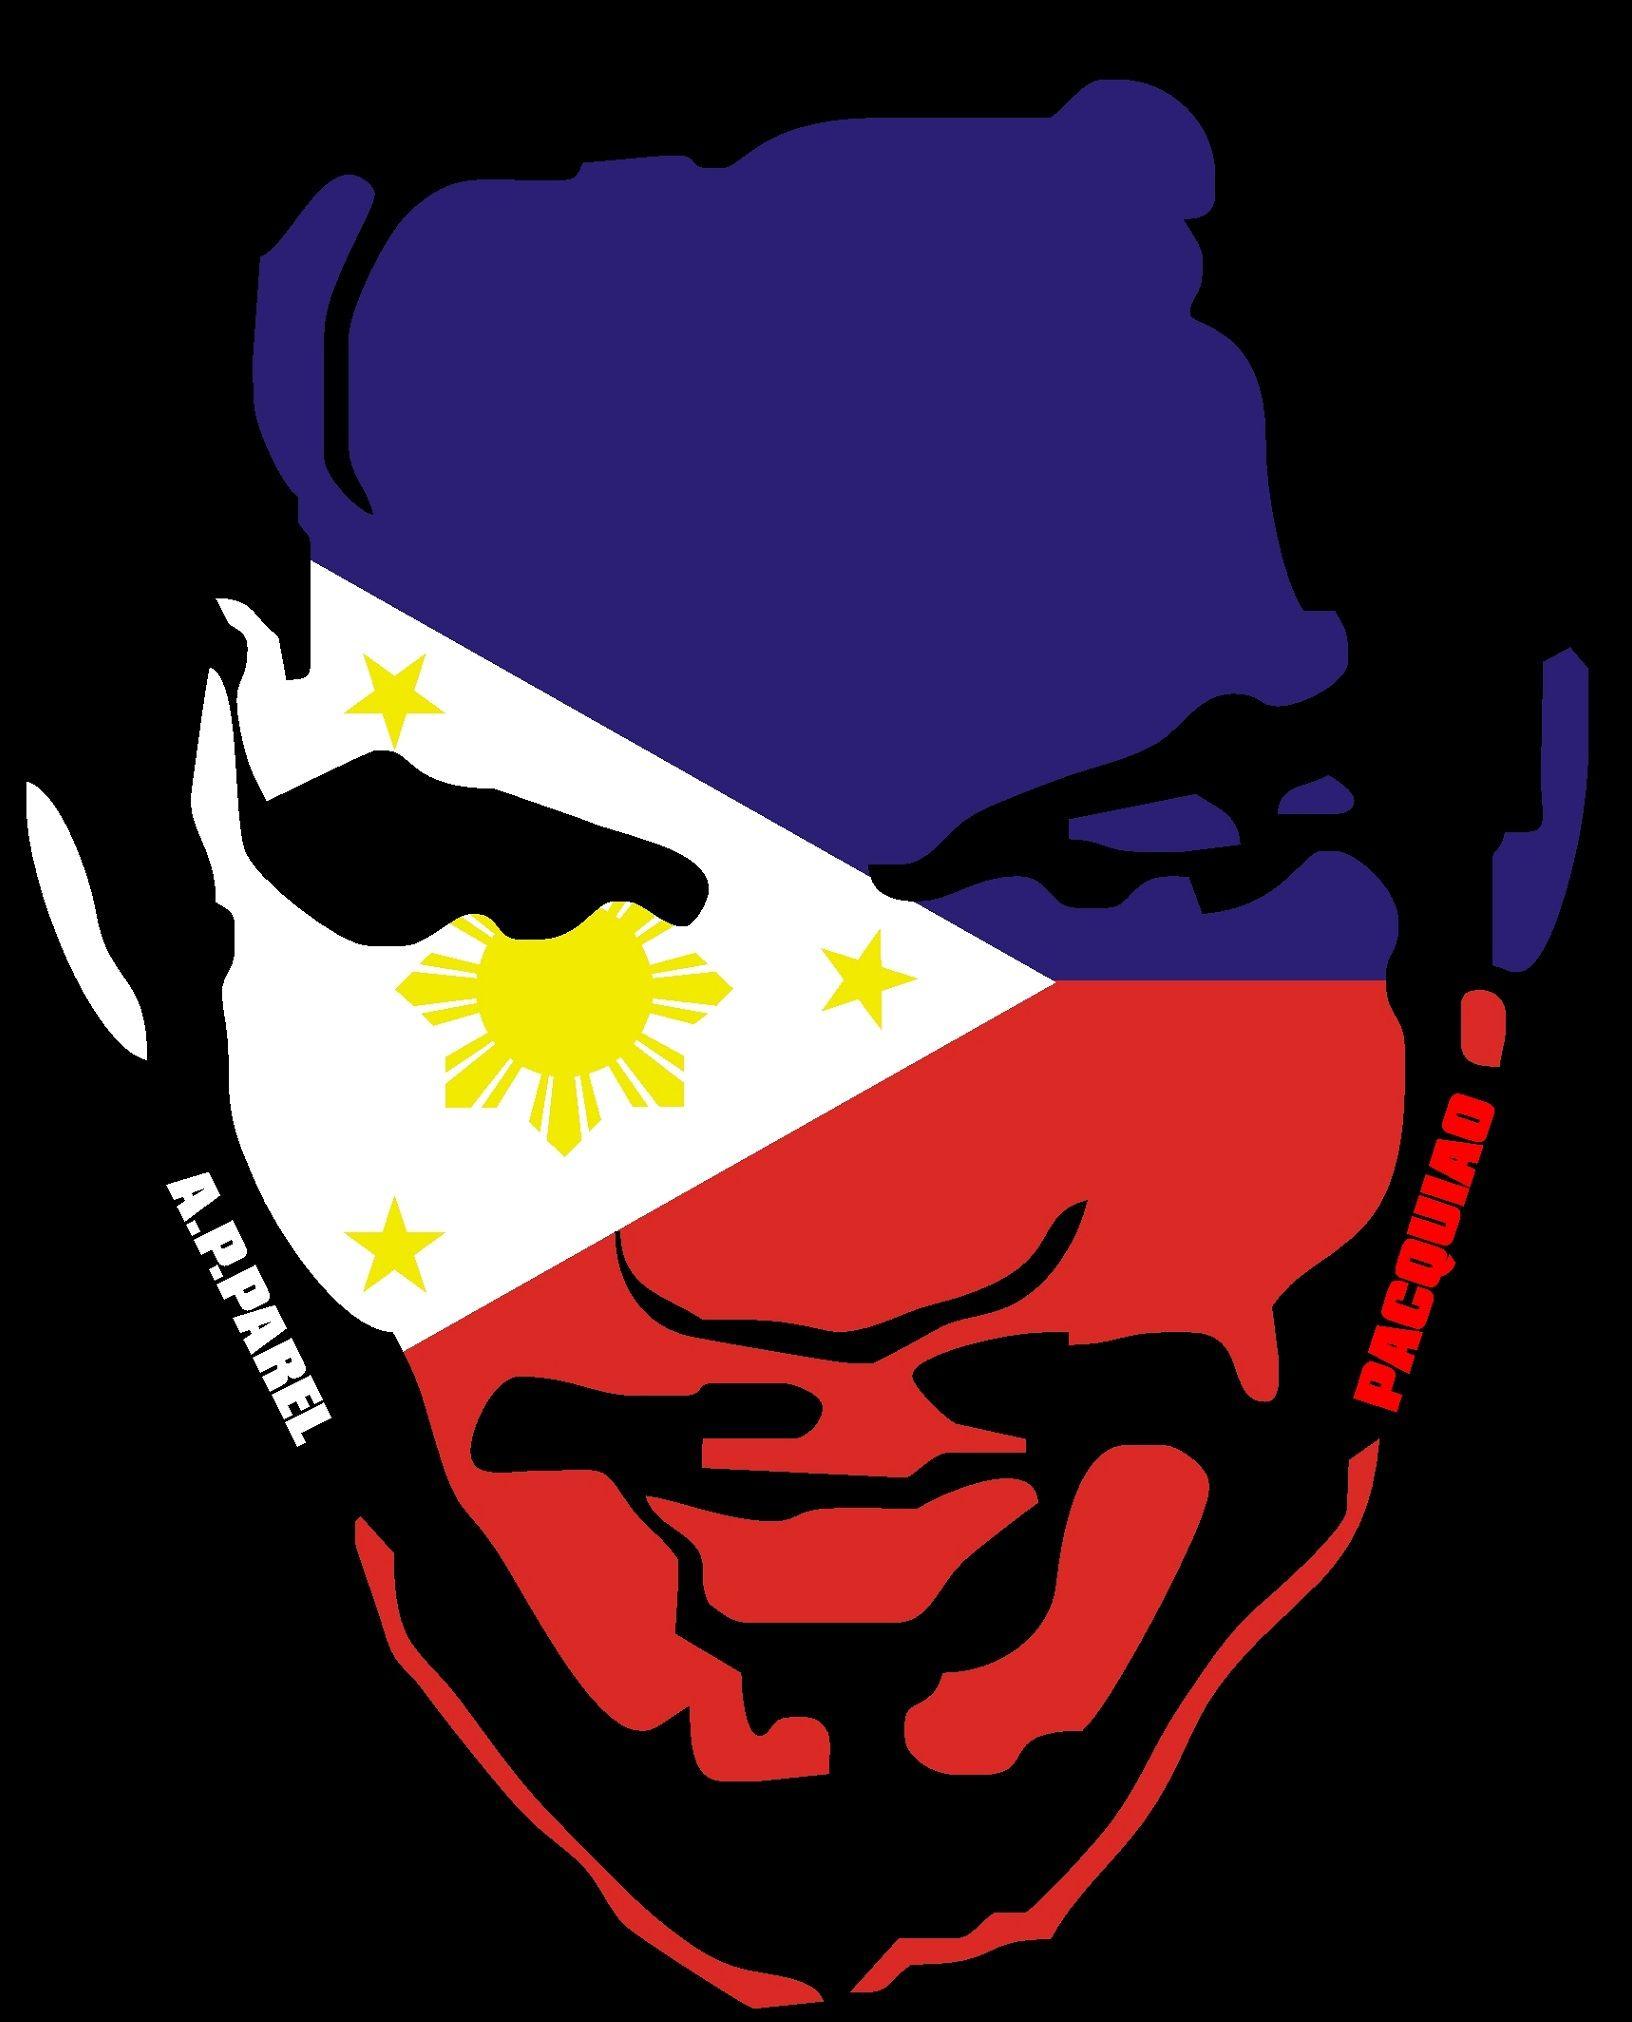 404 Not Found Filipino Flag Philippine Flag Philippines [ 2022 x 1632 Pixel ]